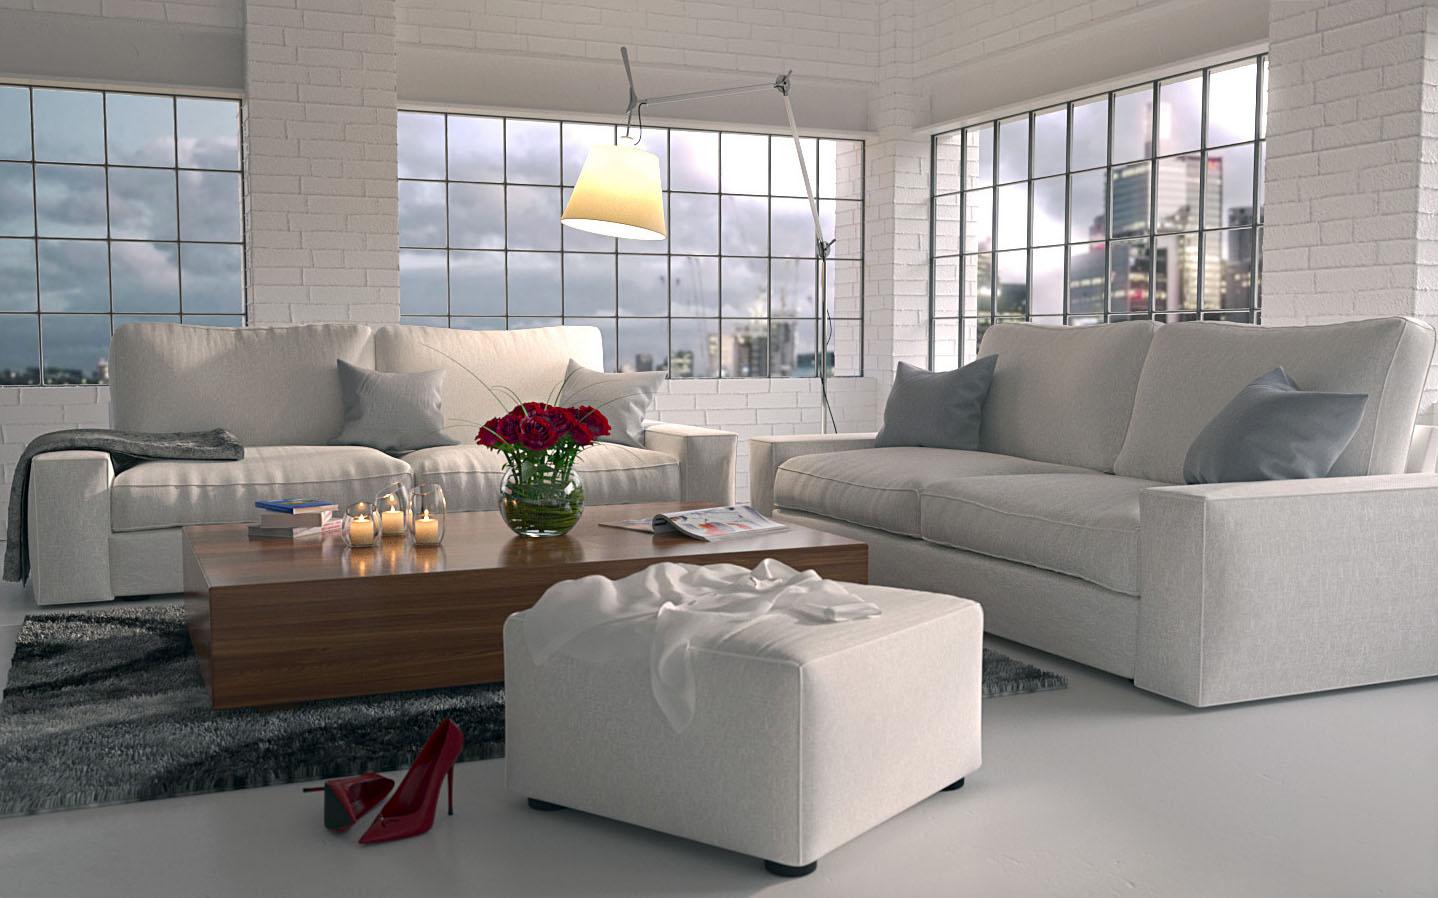 3dpf_industrial_penthouse_slider